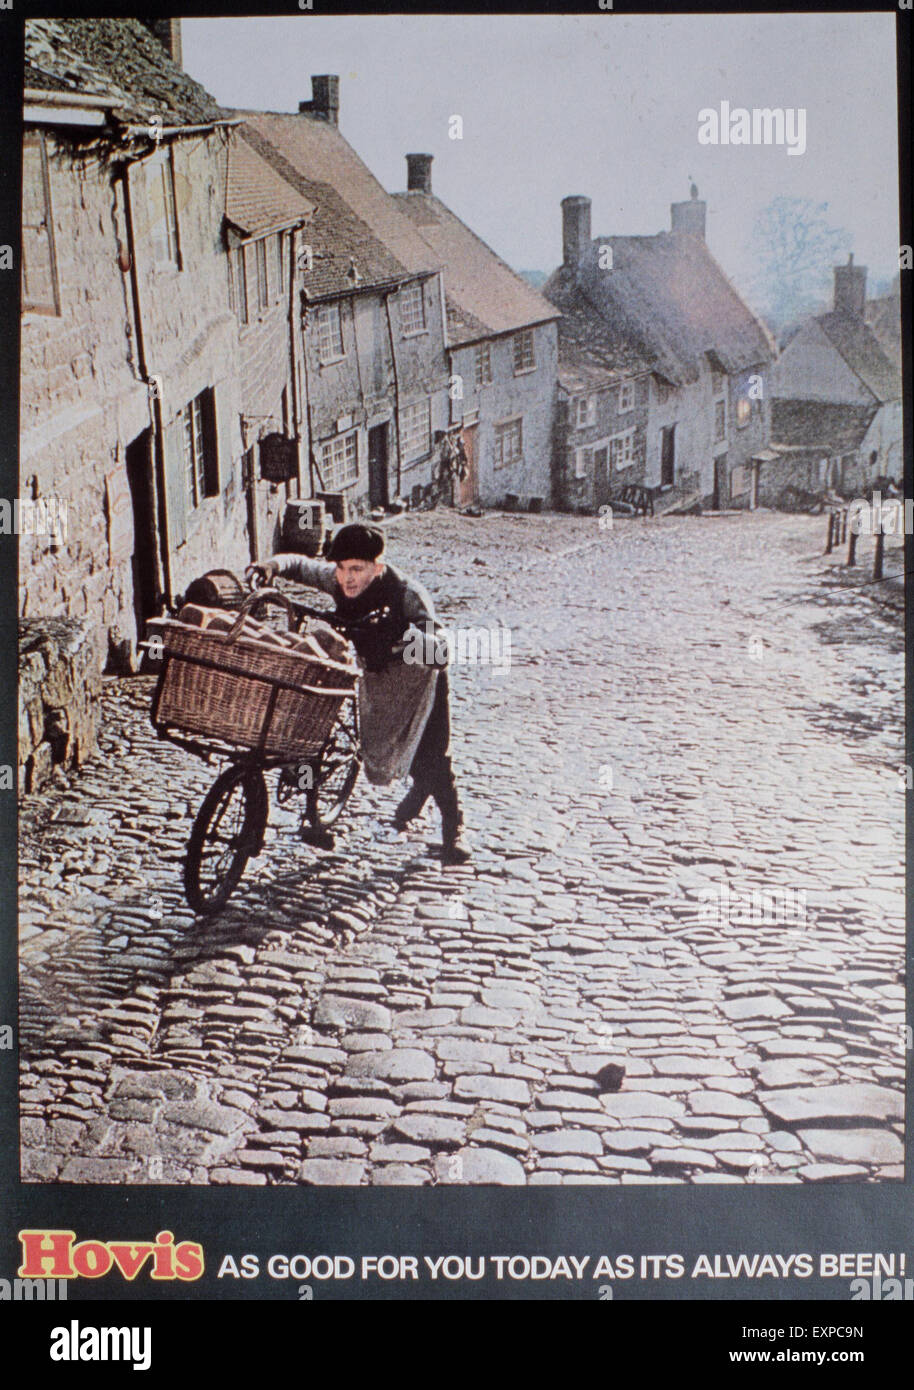 1970s UK Hovis Magazine Advert - Stock Image